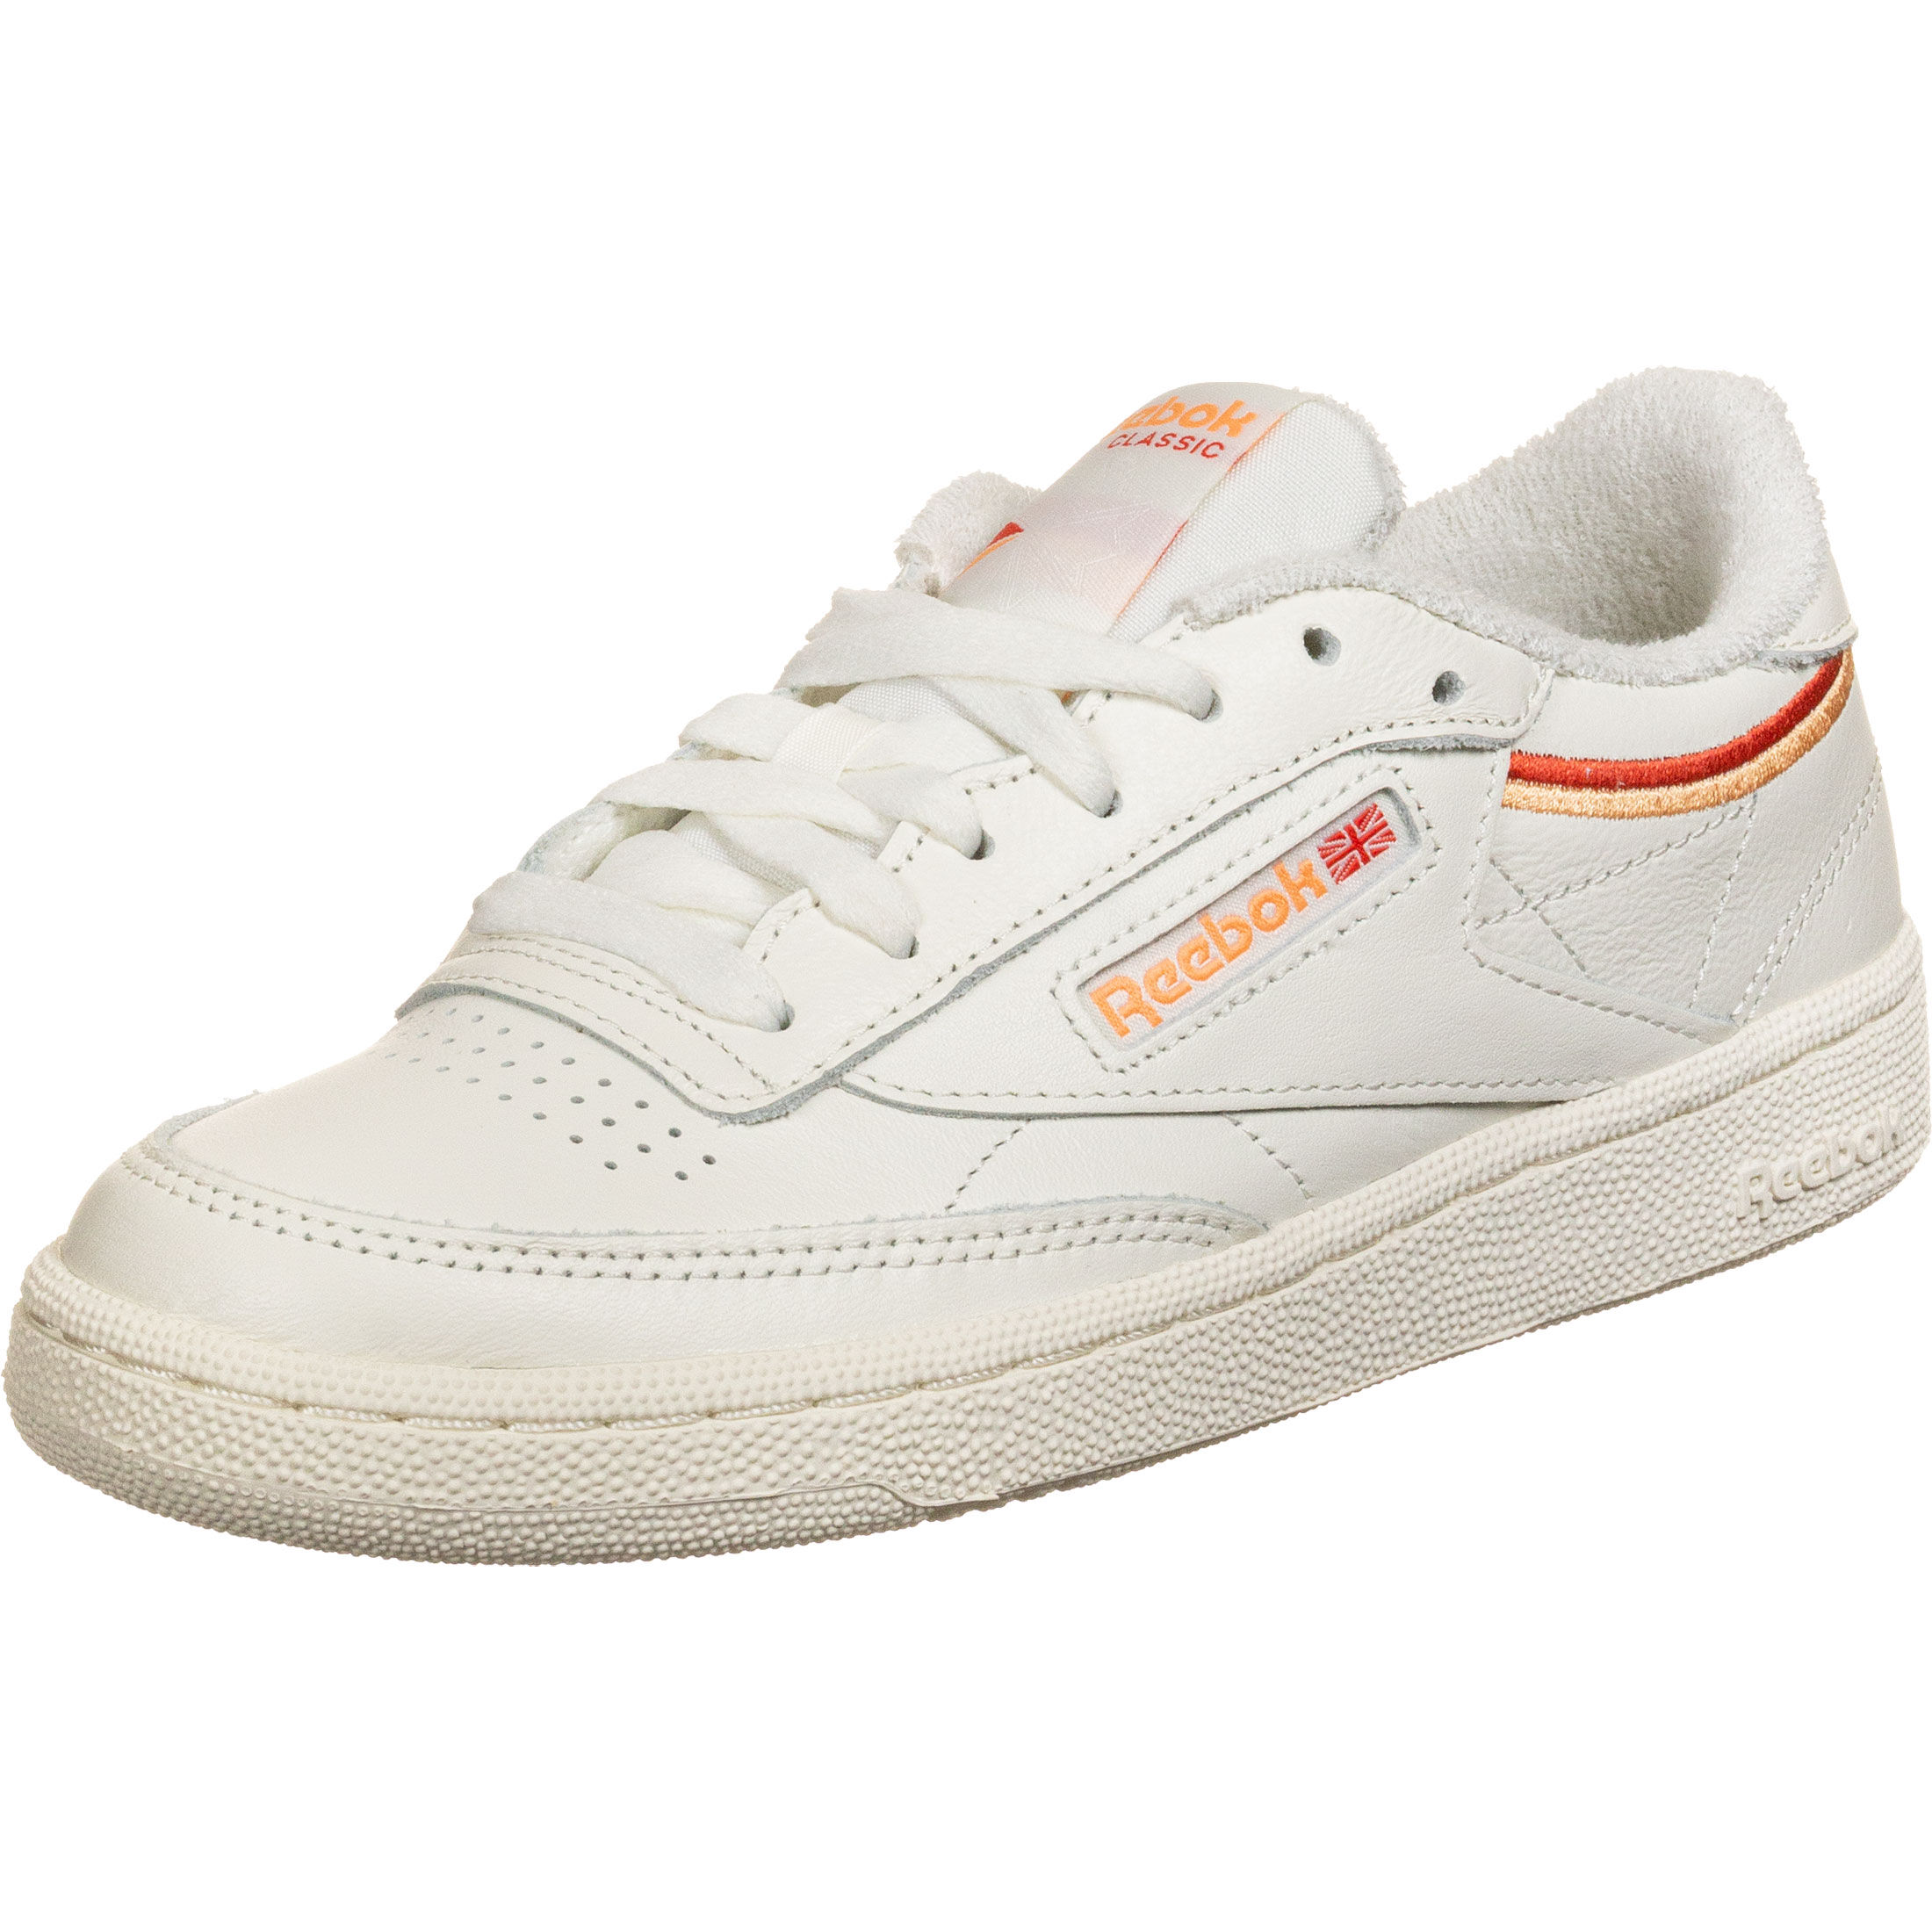 Reebok Club C 85 W - Sneakers Low at